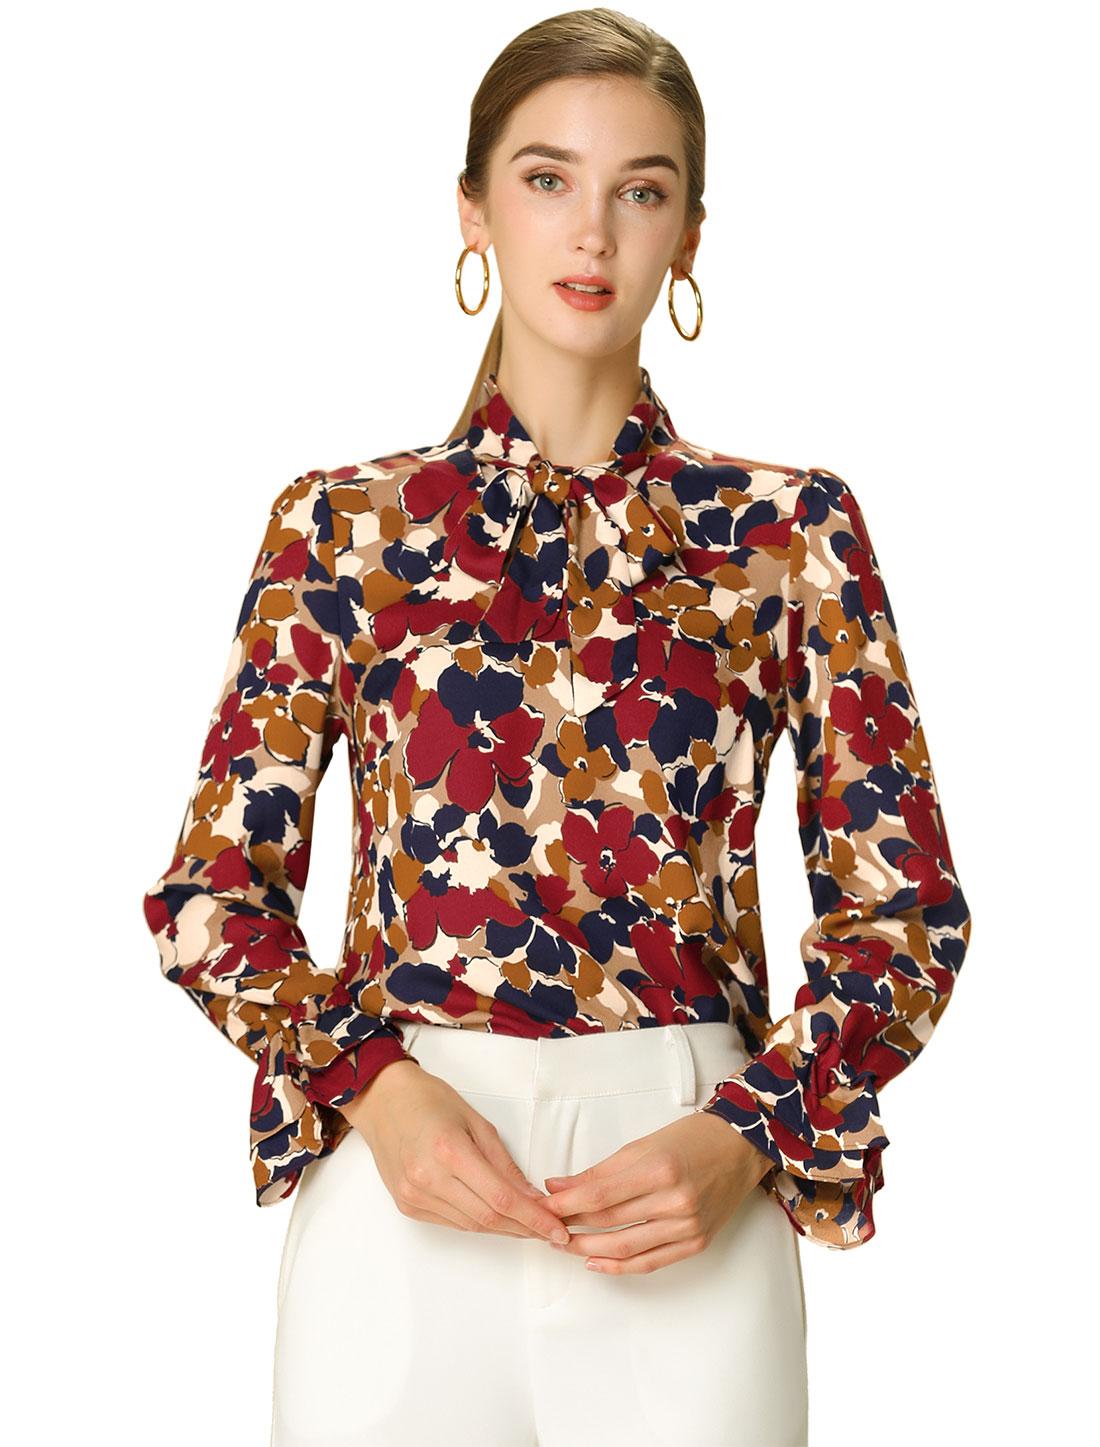 Allegra K Women's Tie Neck Long Sleeve Floral Shirt Red S (US 6)